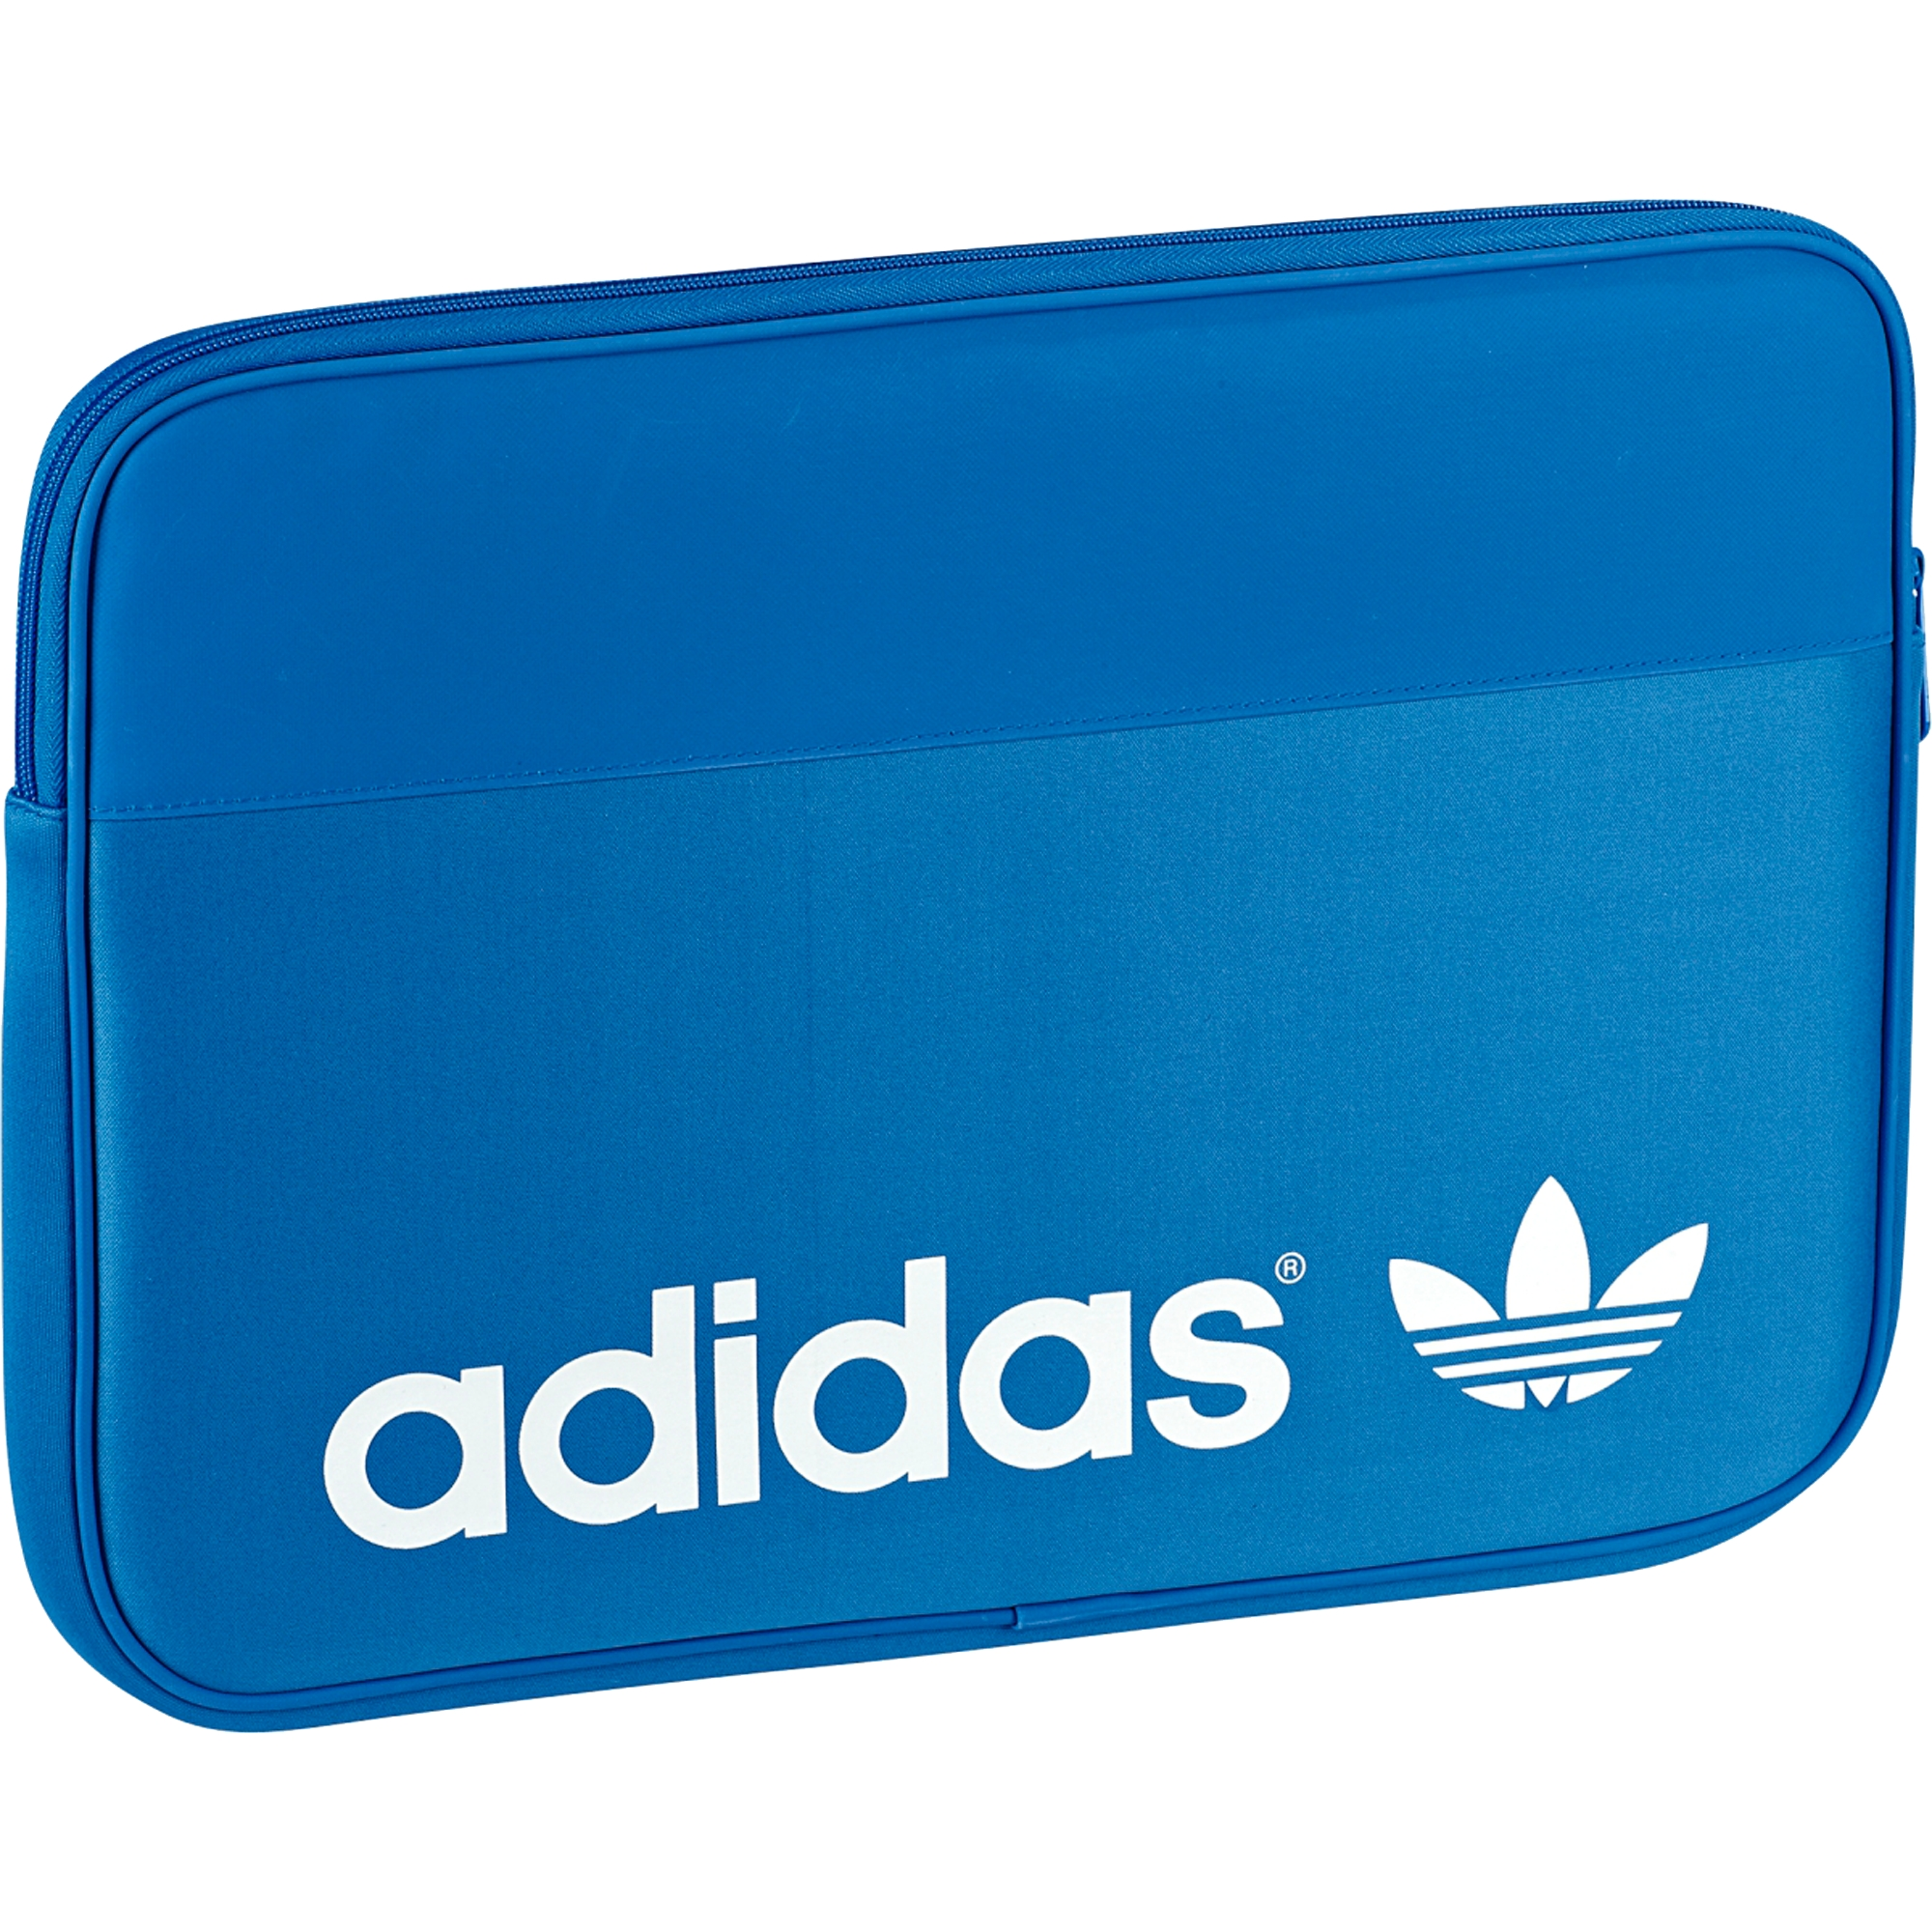 a86816f8edb88 adidas Laptop Sleeve Basic Çanta #F79665 - Barcin.com